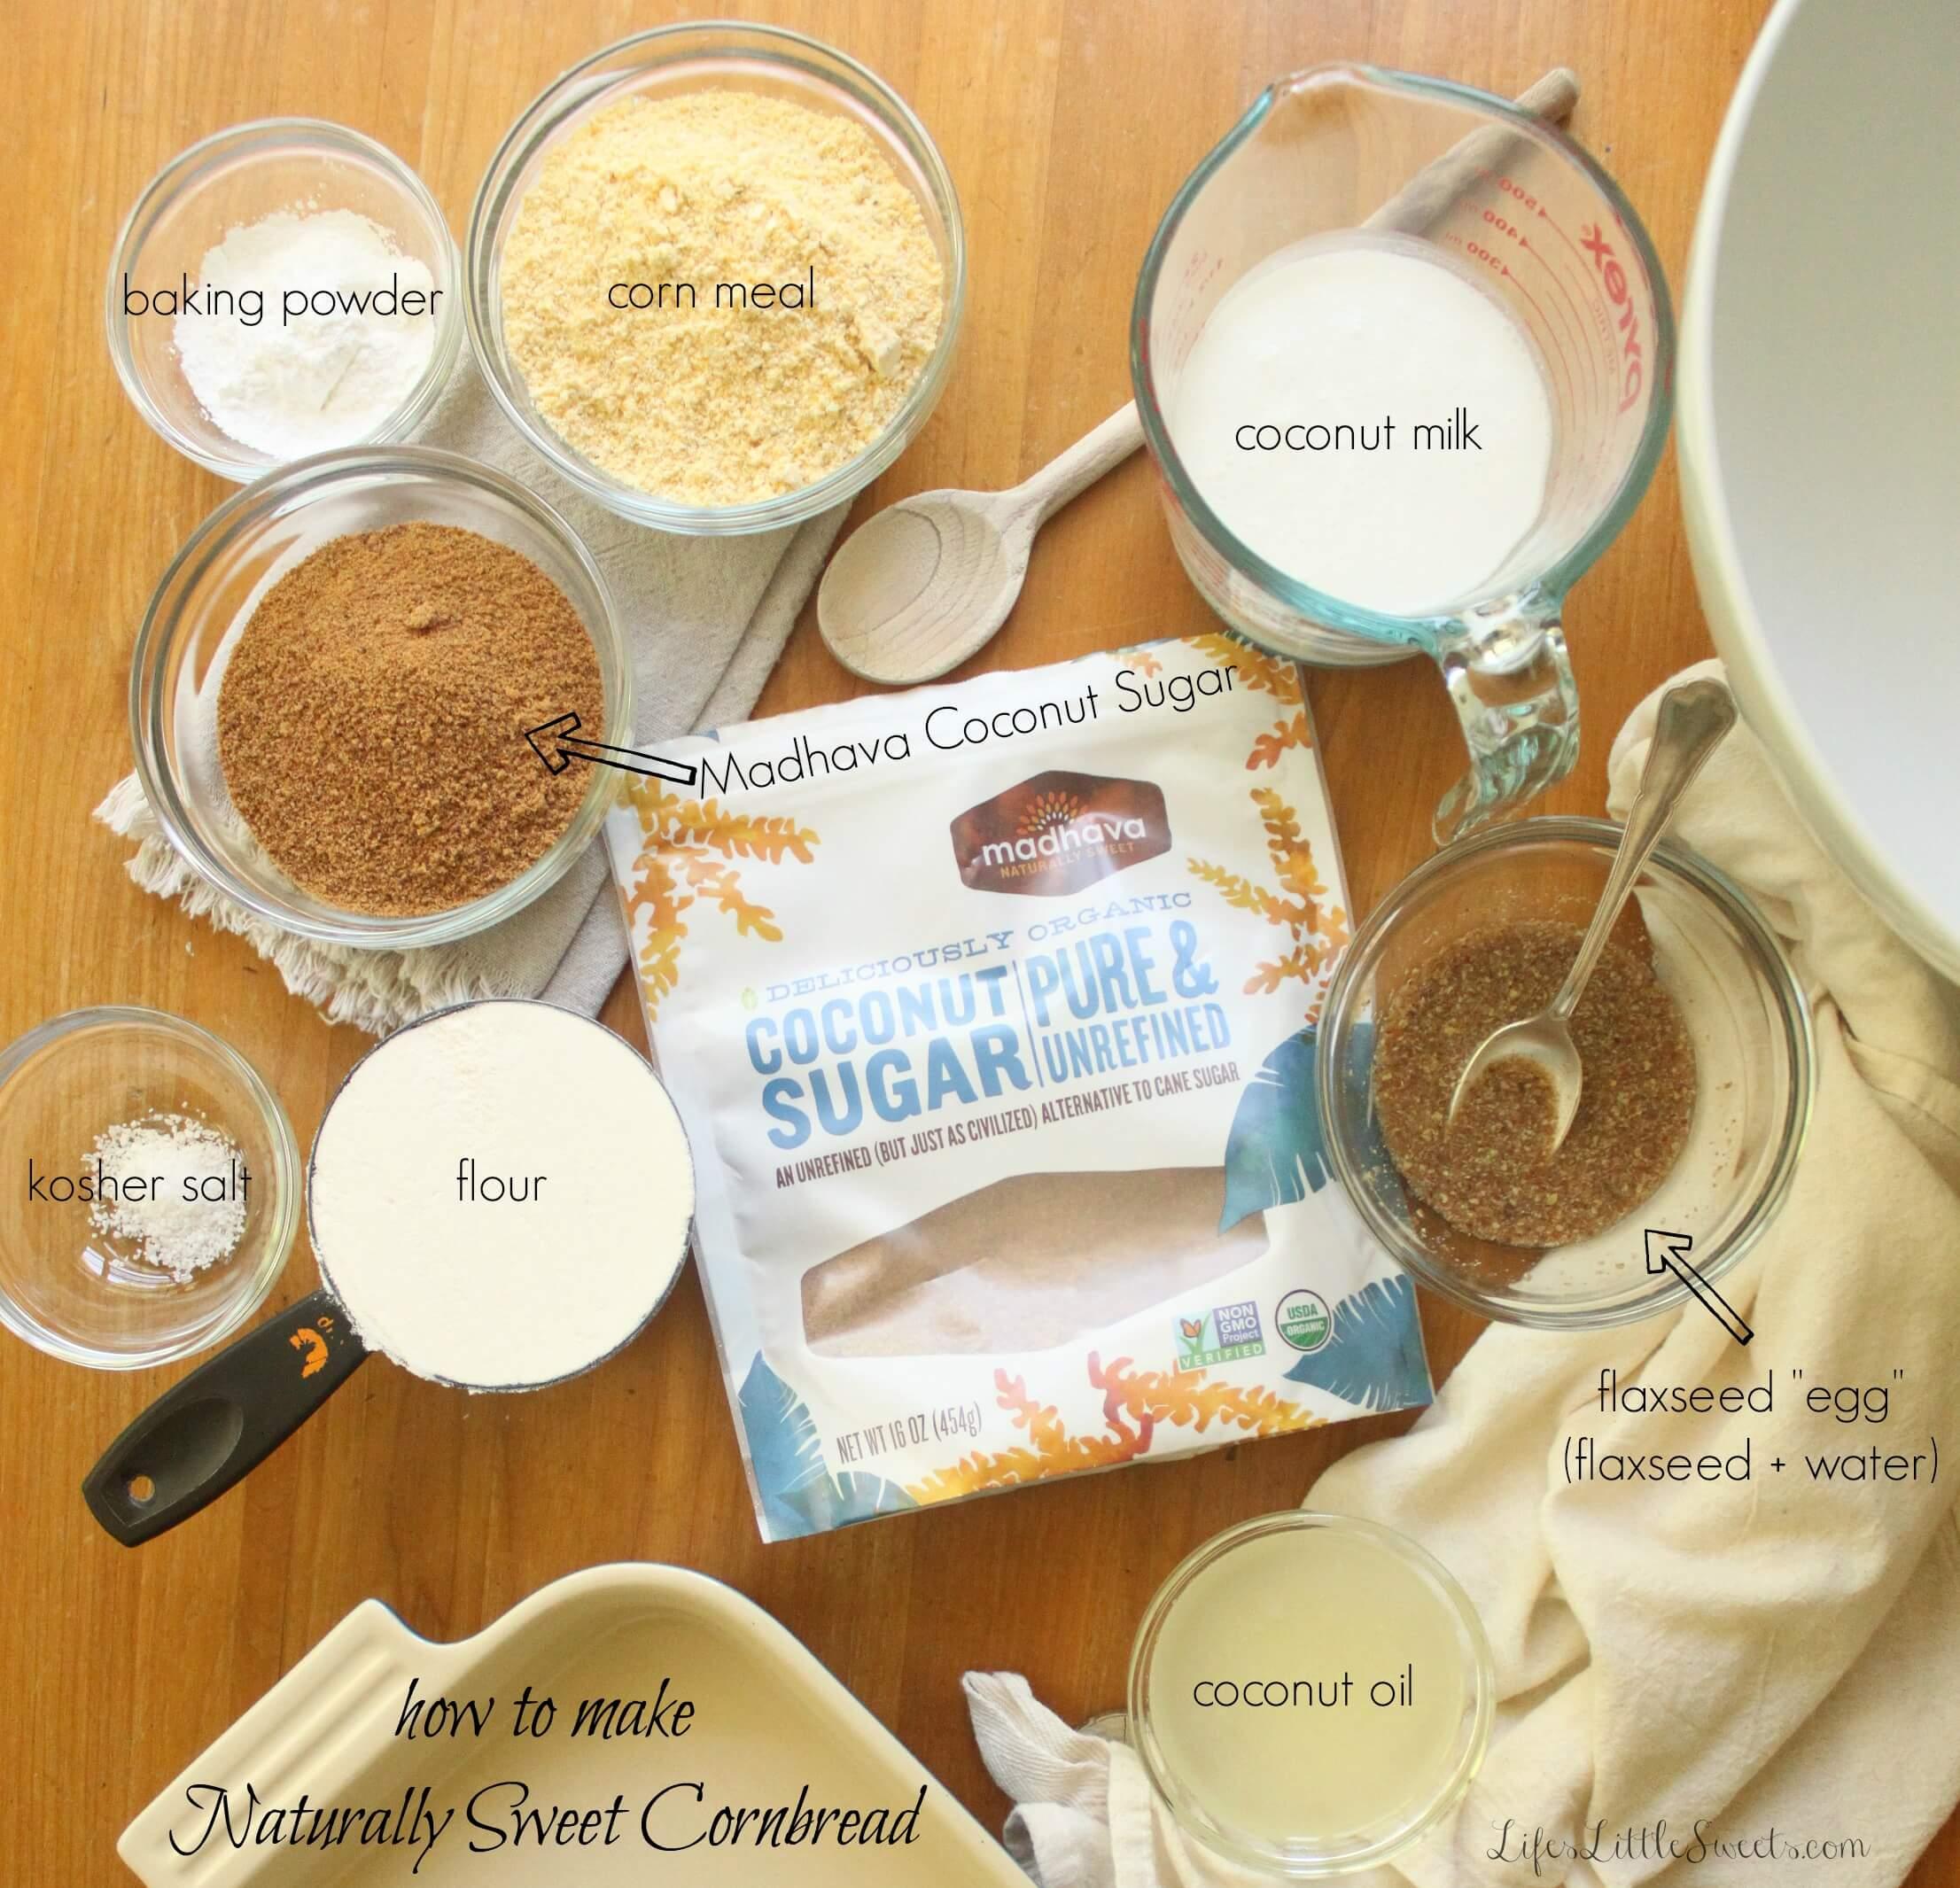 how to make naturally sweet cornbread